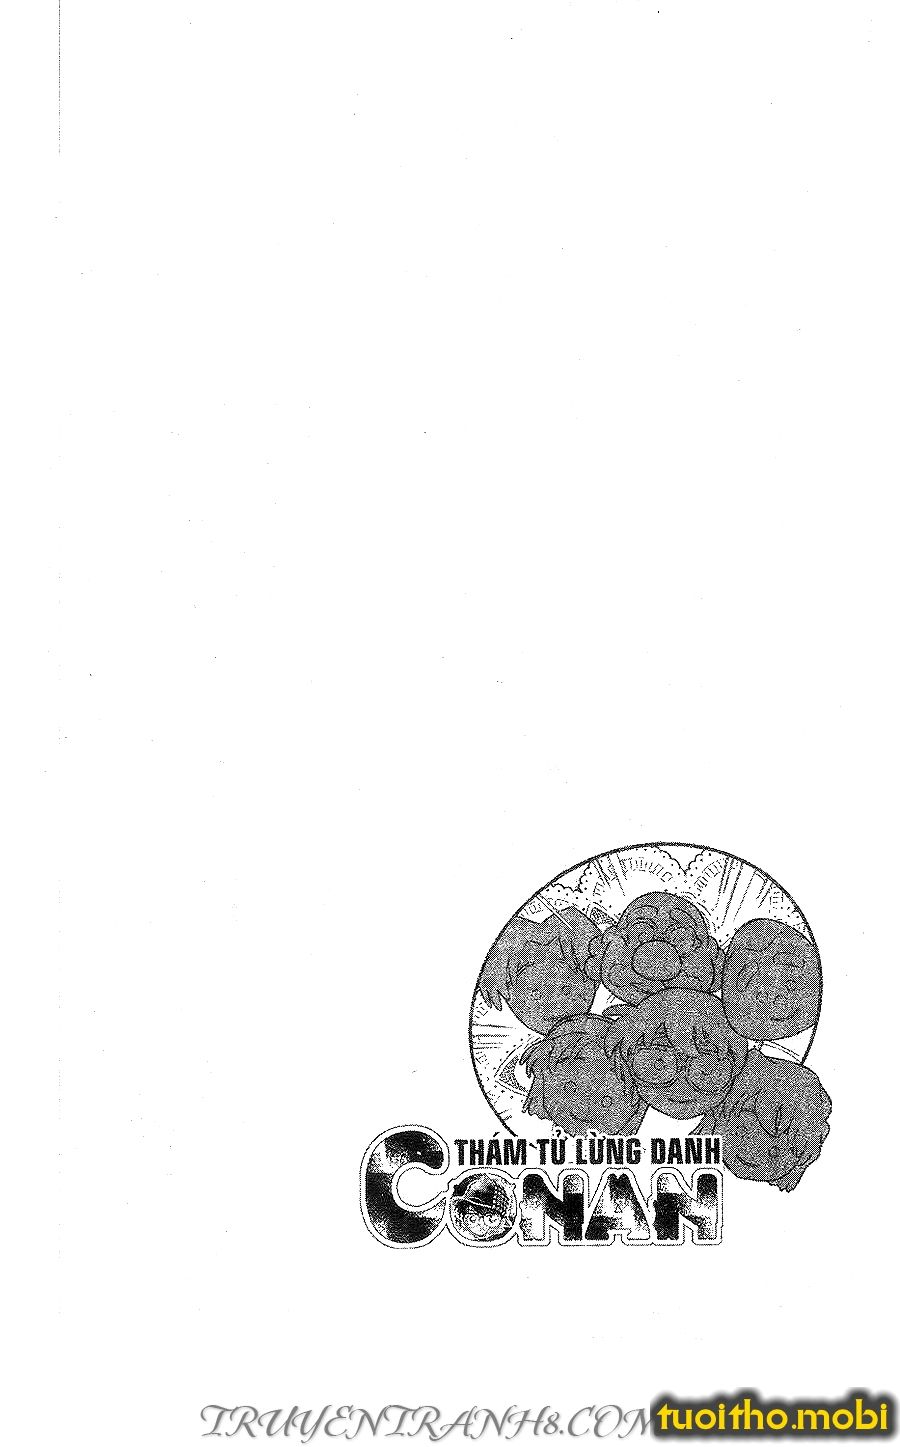 conan chương 331 trang 3